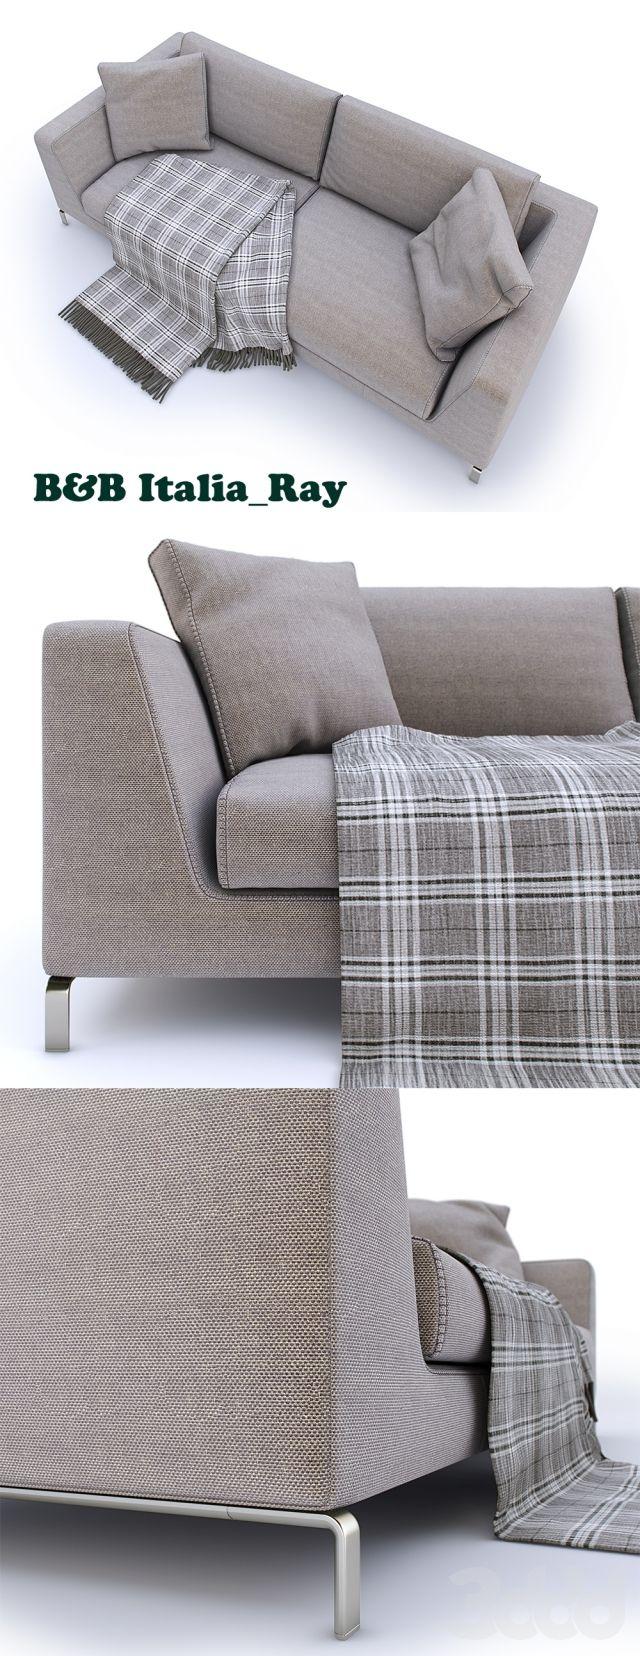 3d модели: Диваны - B&B Italia sofa Ray